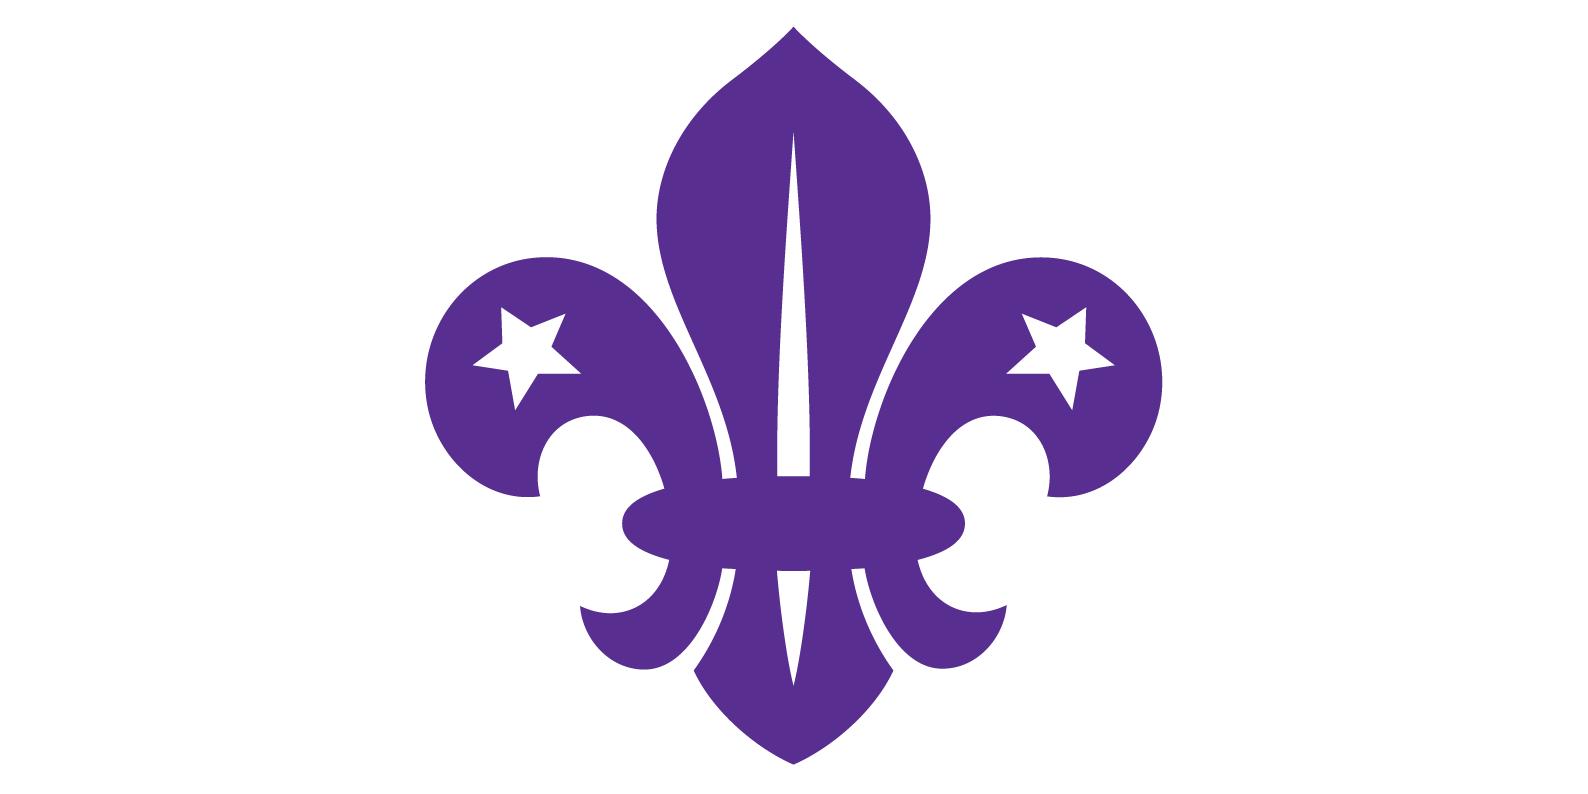 scouts-logo-fleur-wide-1493551450.png